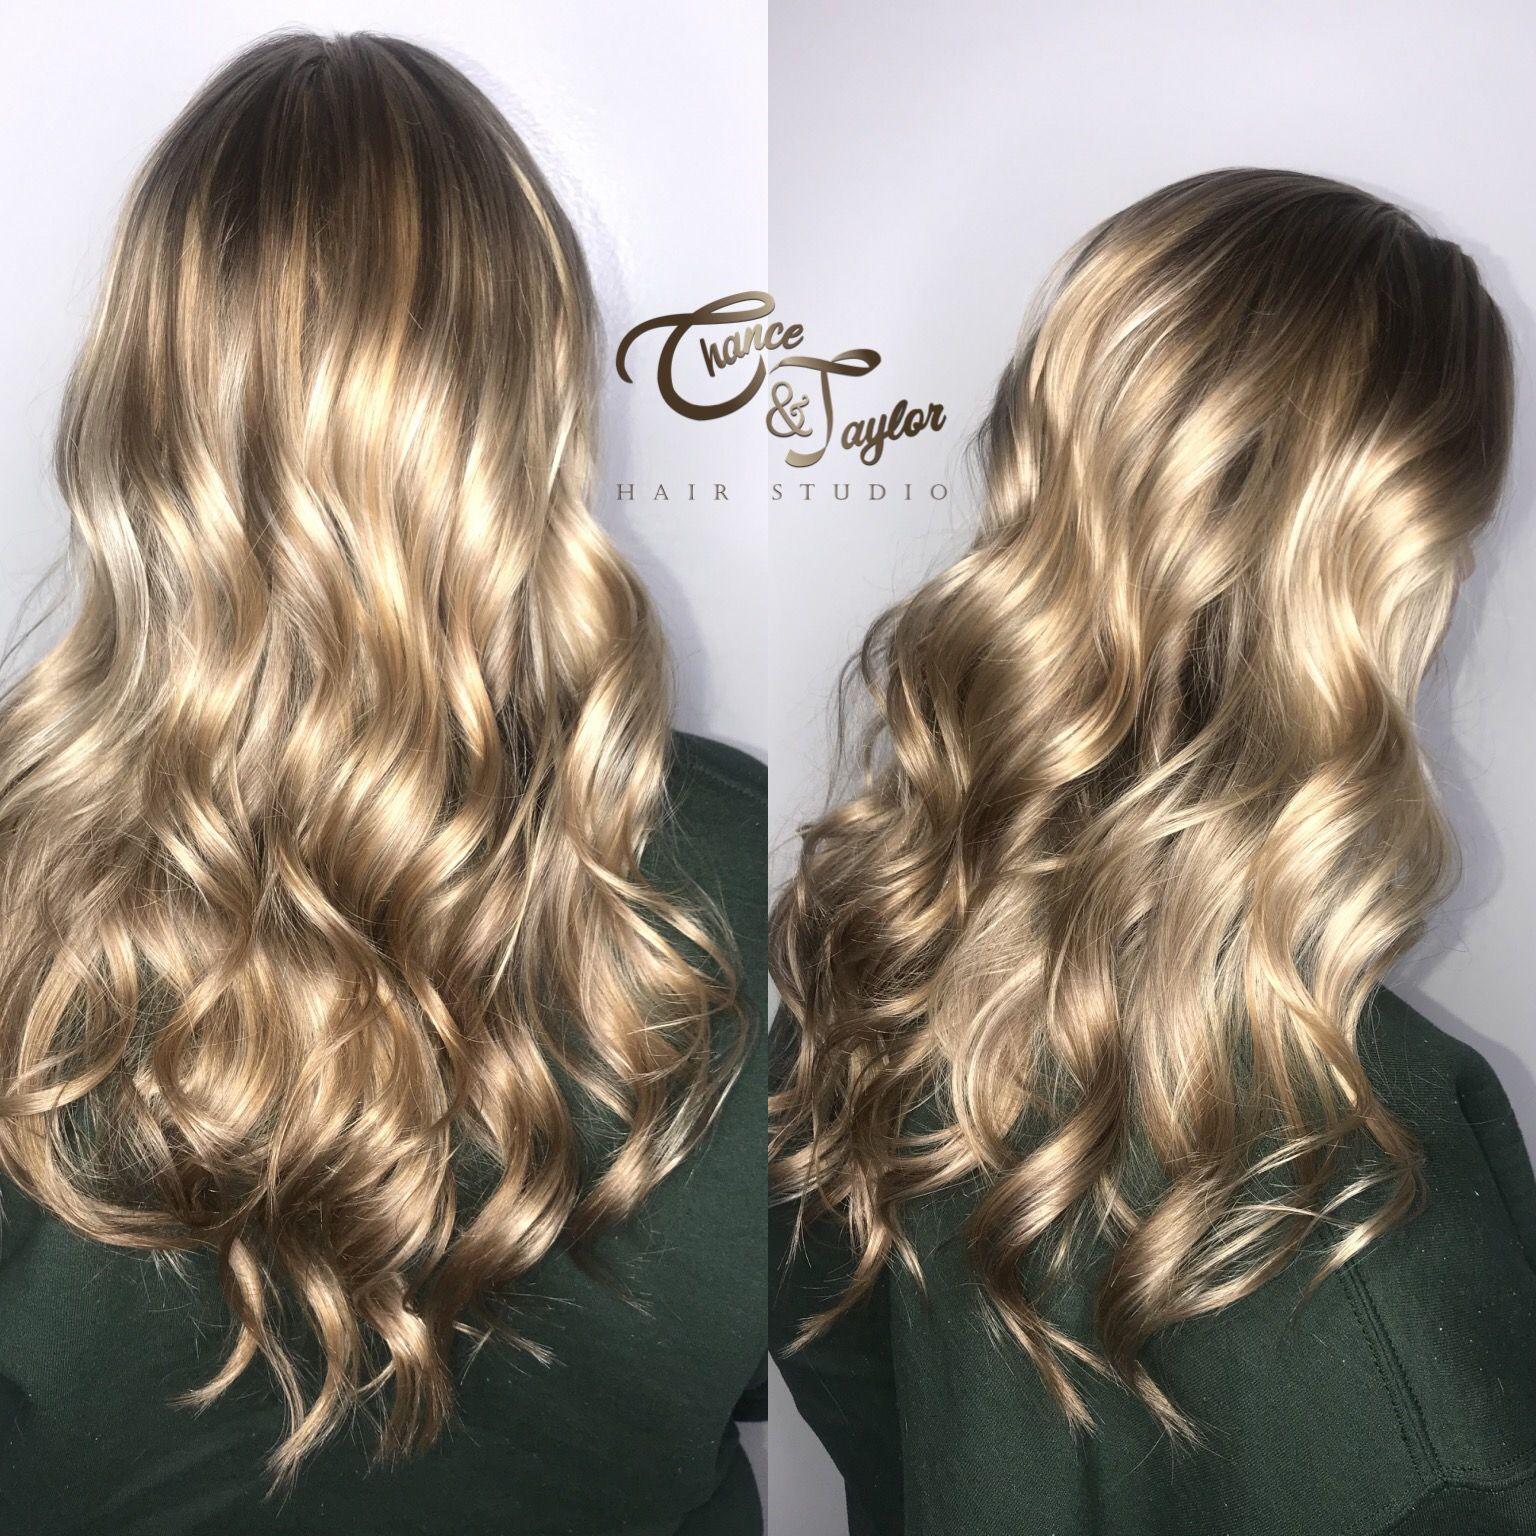 Pin By Stossy On Snips In 2020 Hair Styles Hair Studio Long Hair Styles